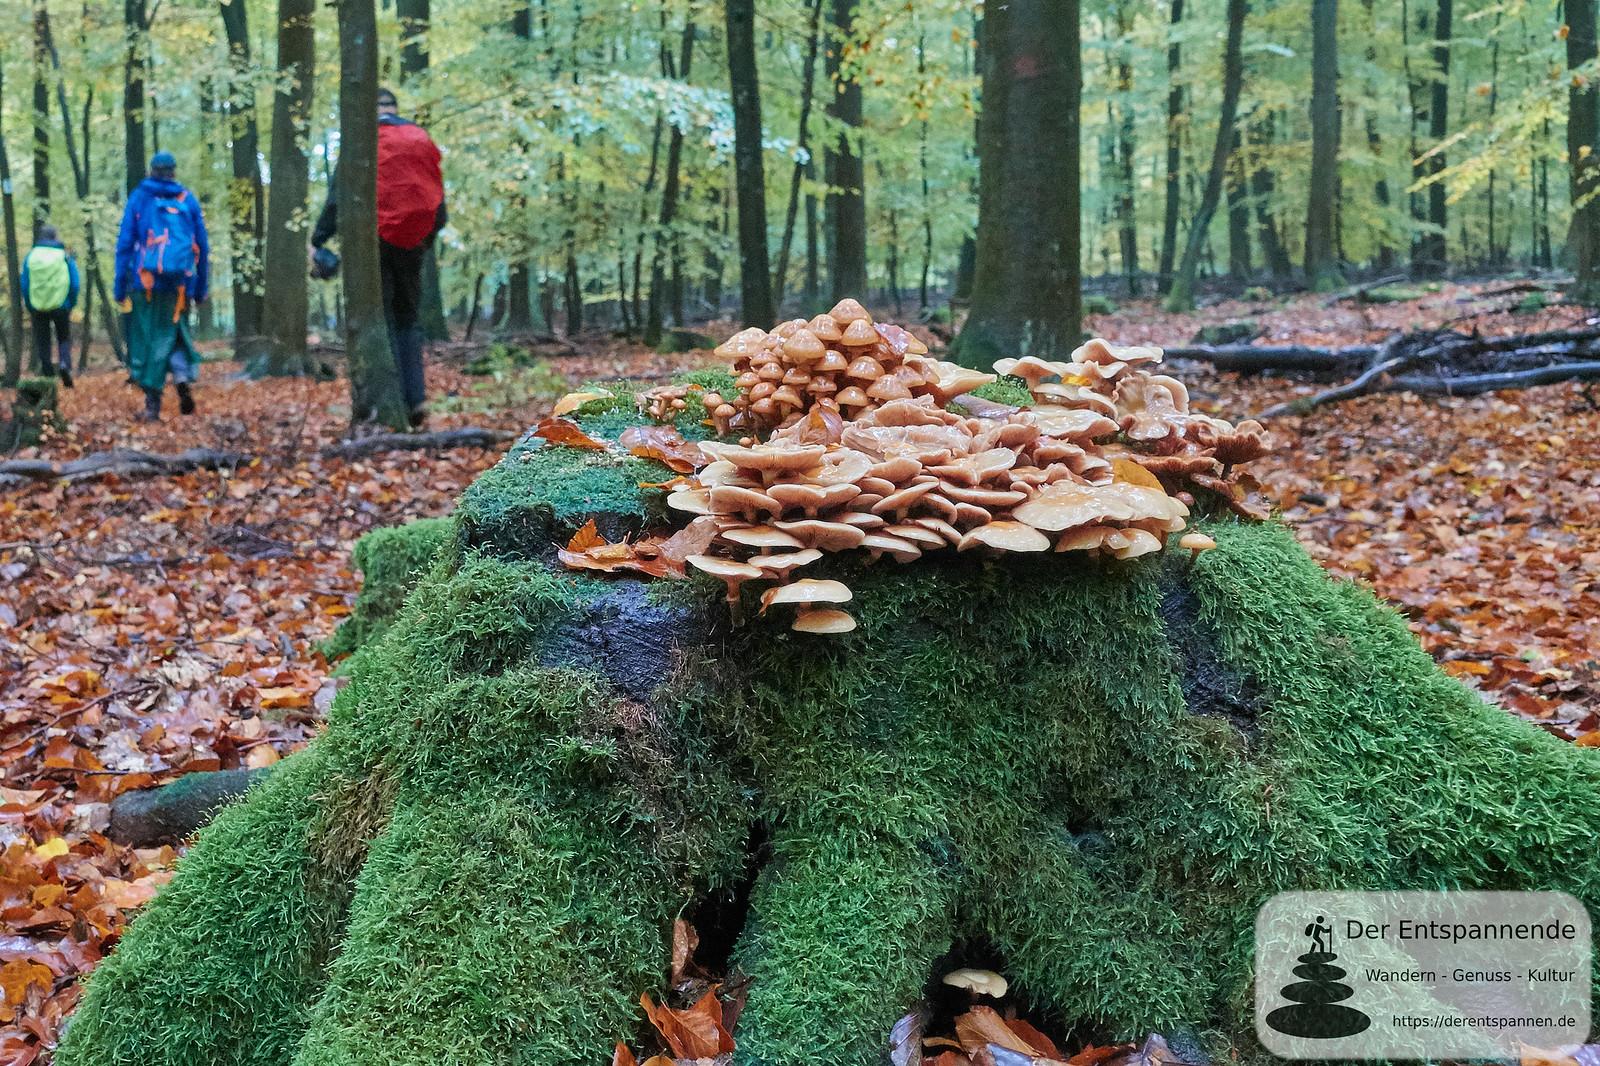 Pilze im Wald, Saar-Hunsrück-Steig, Etappe 12